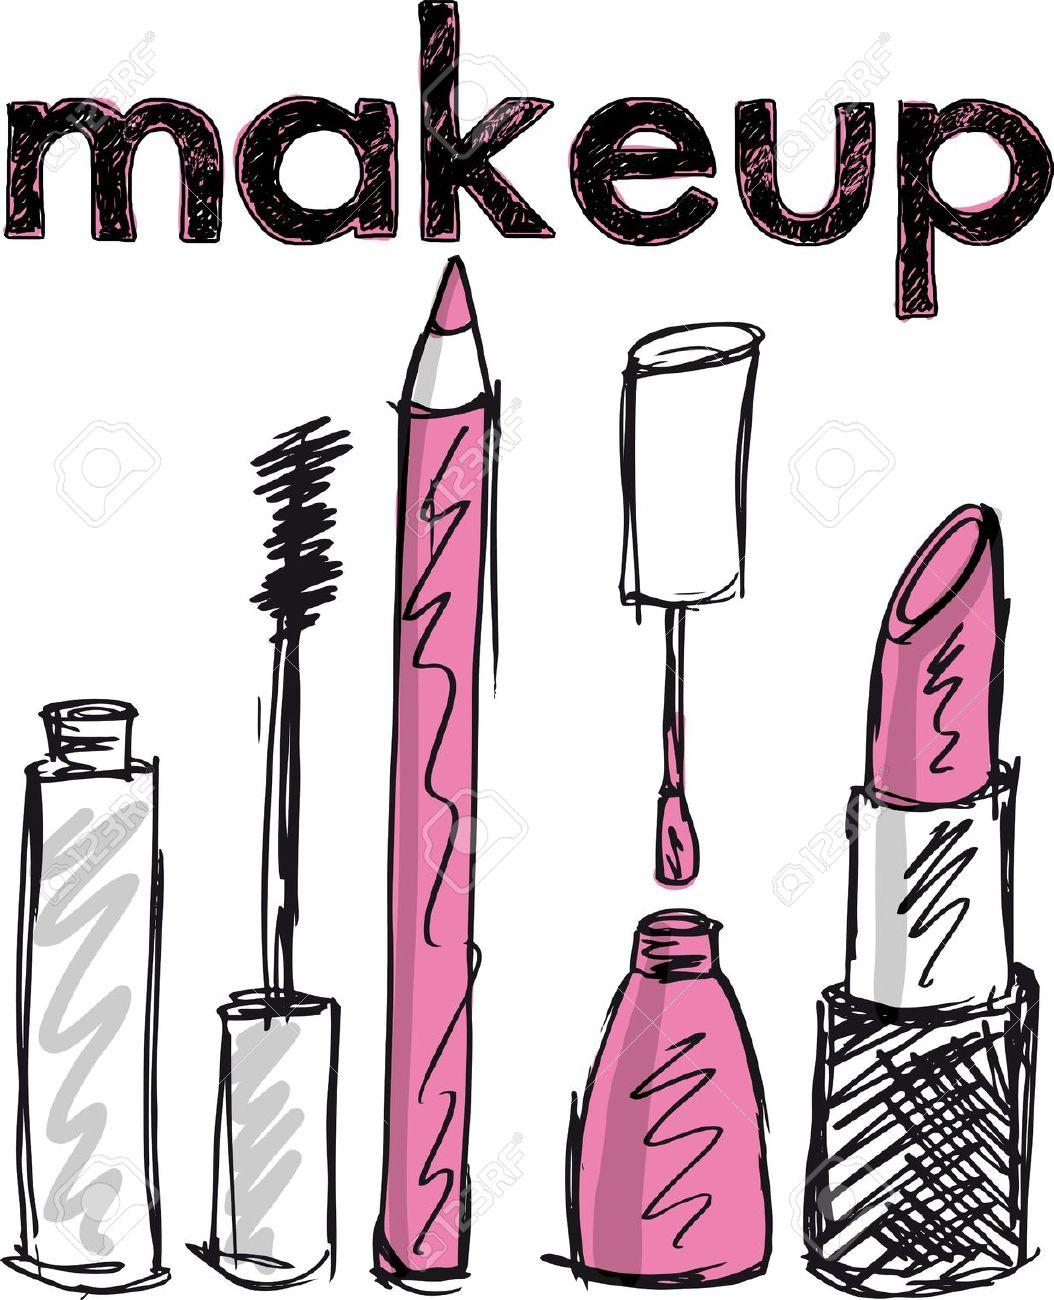 1000+ images about fondos de maquillaje on Pinterest.